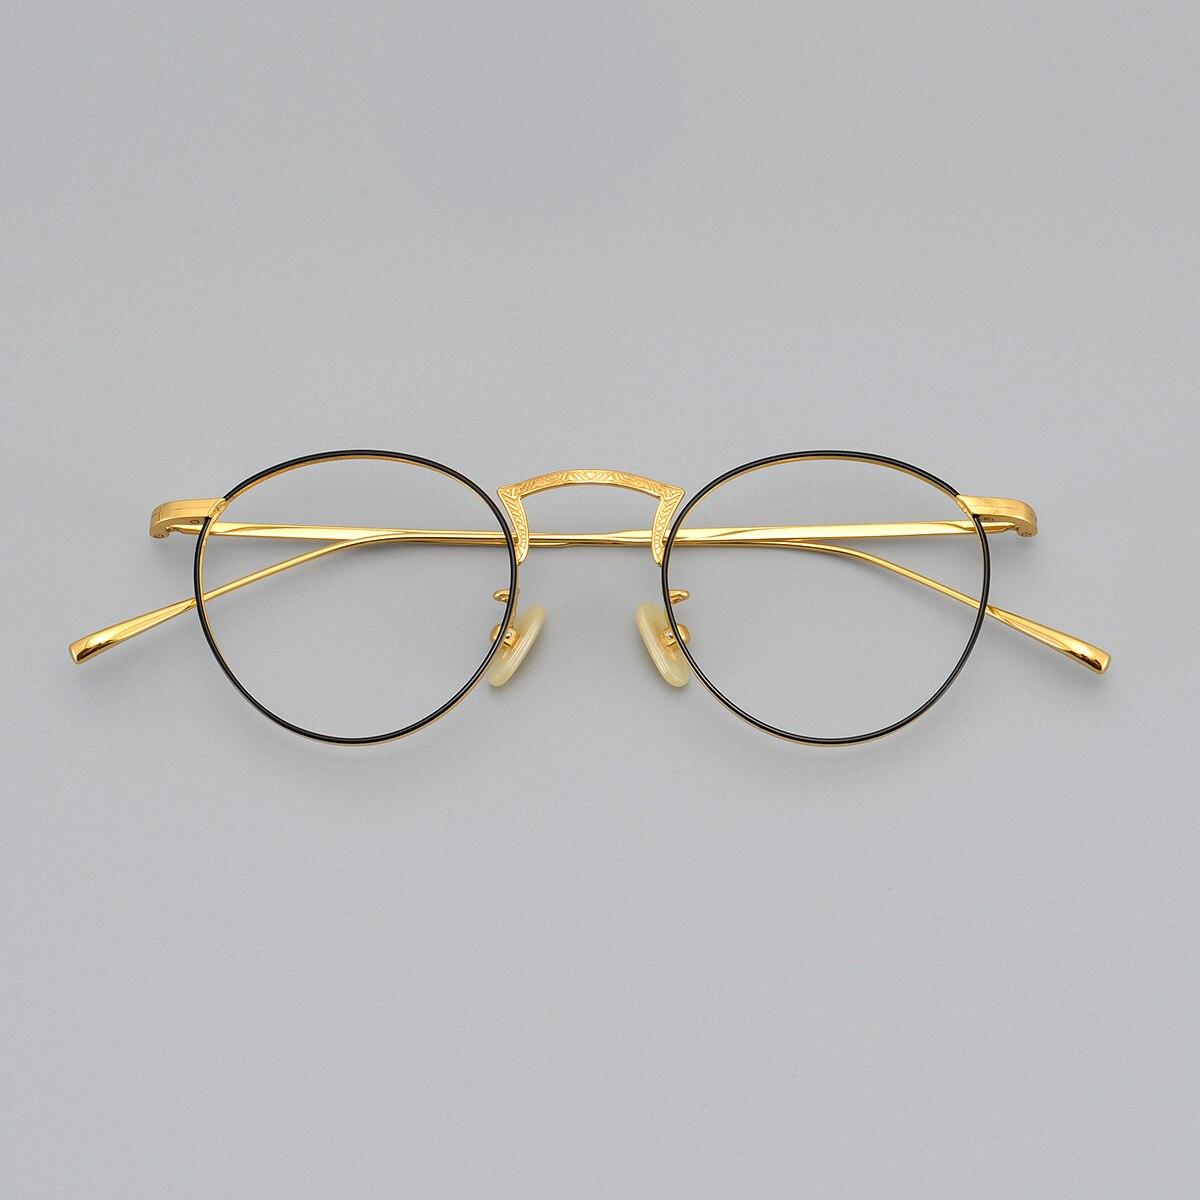 6g Titanium Eyeglasses Frame Men Women Gold Glasses Man Optic Prescription Spectacles Vintage Nerd Fashion Eyewear